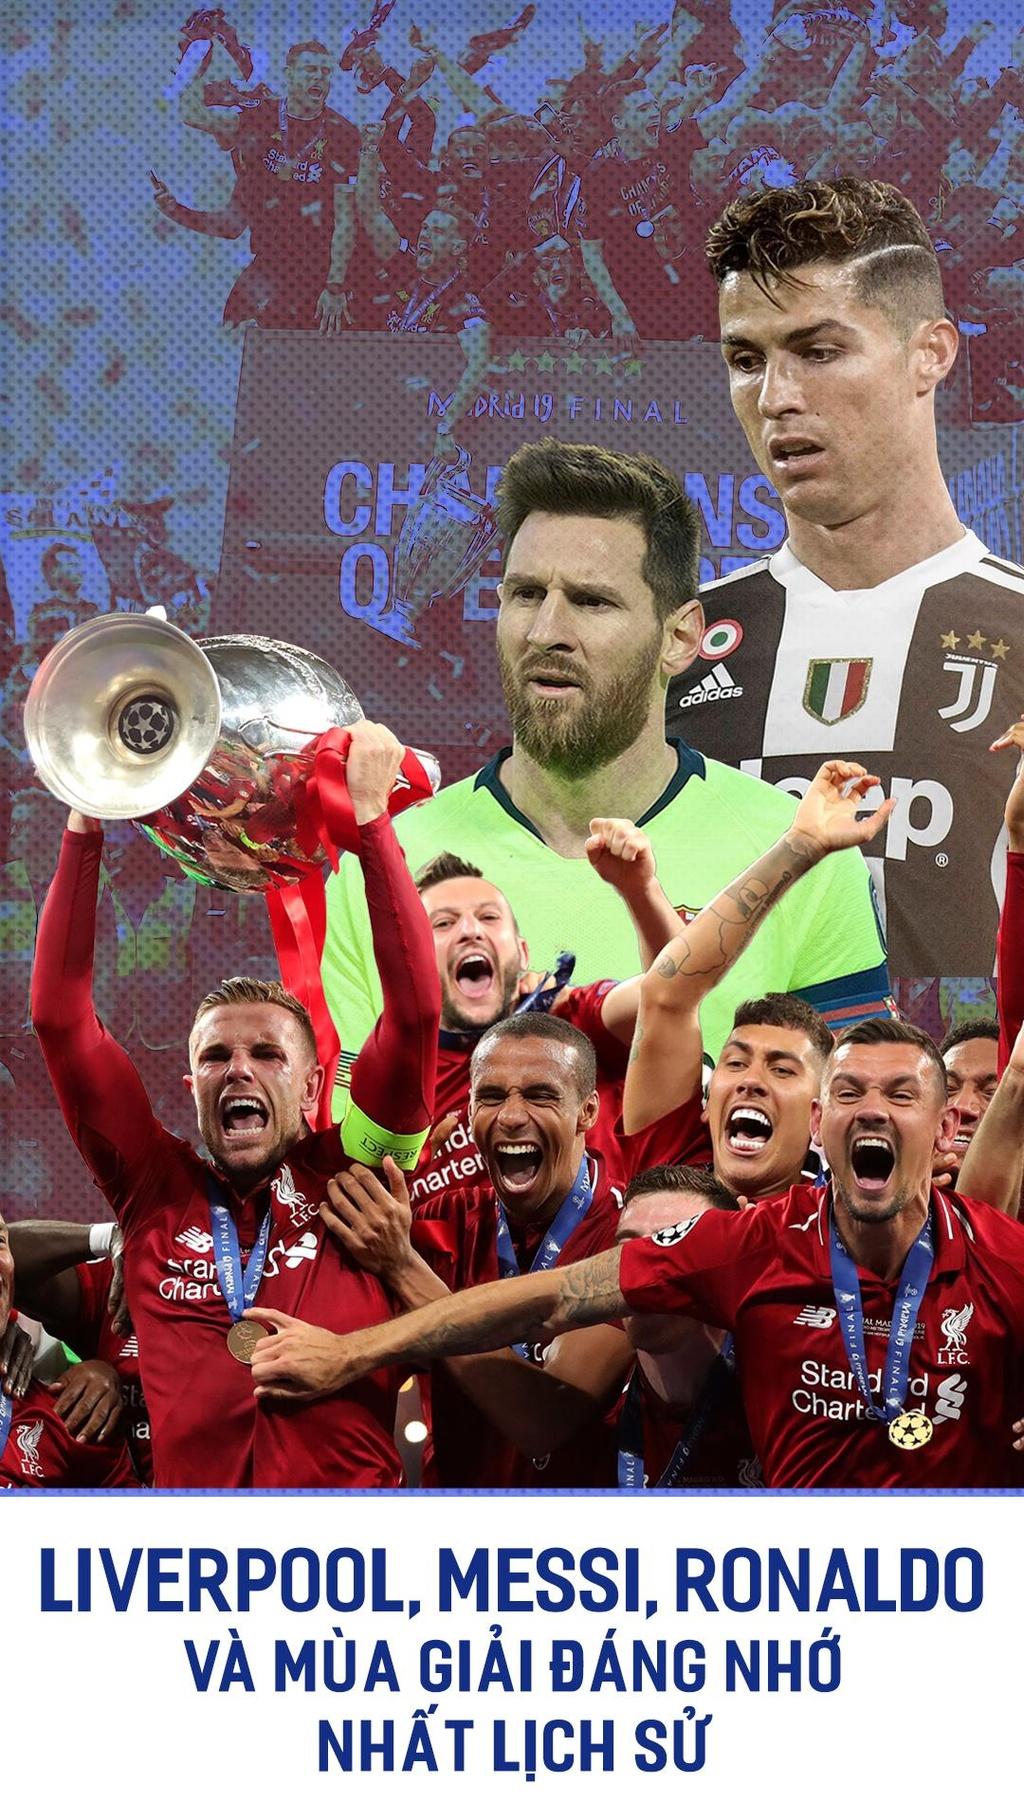 Liverpool va mua giai Champions League dang nho nhat lich su hinh anh 1